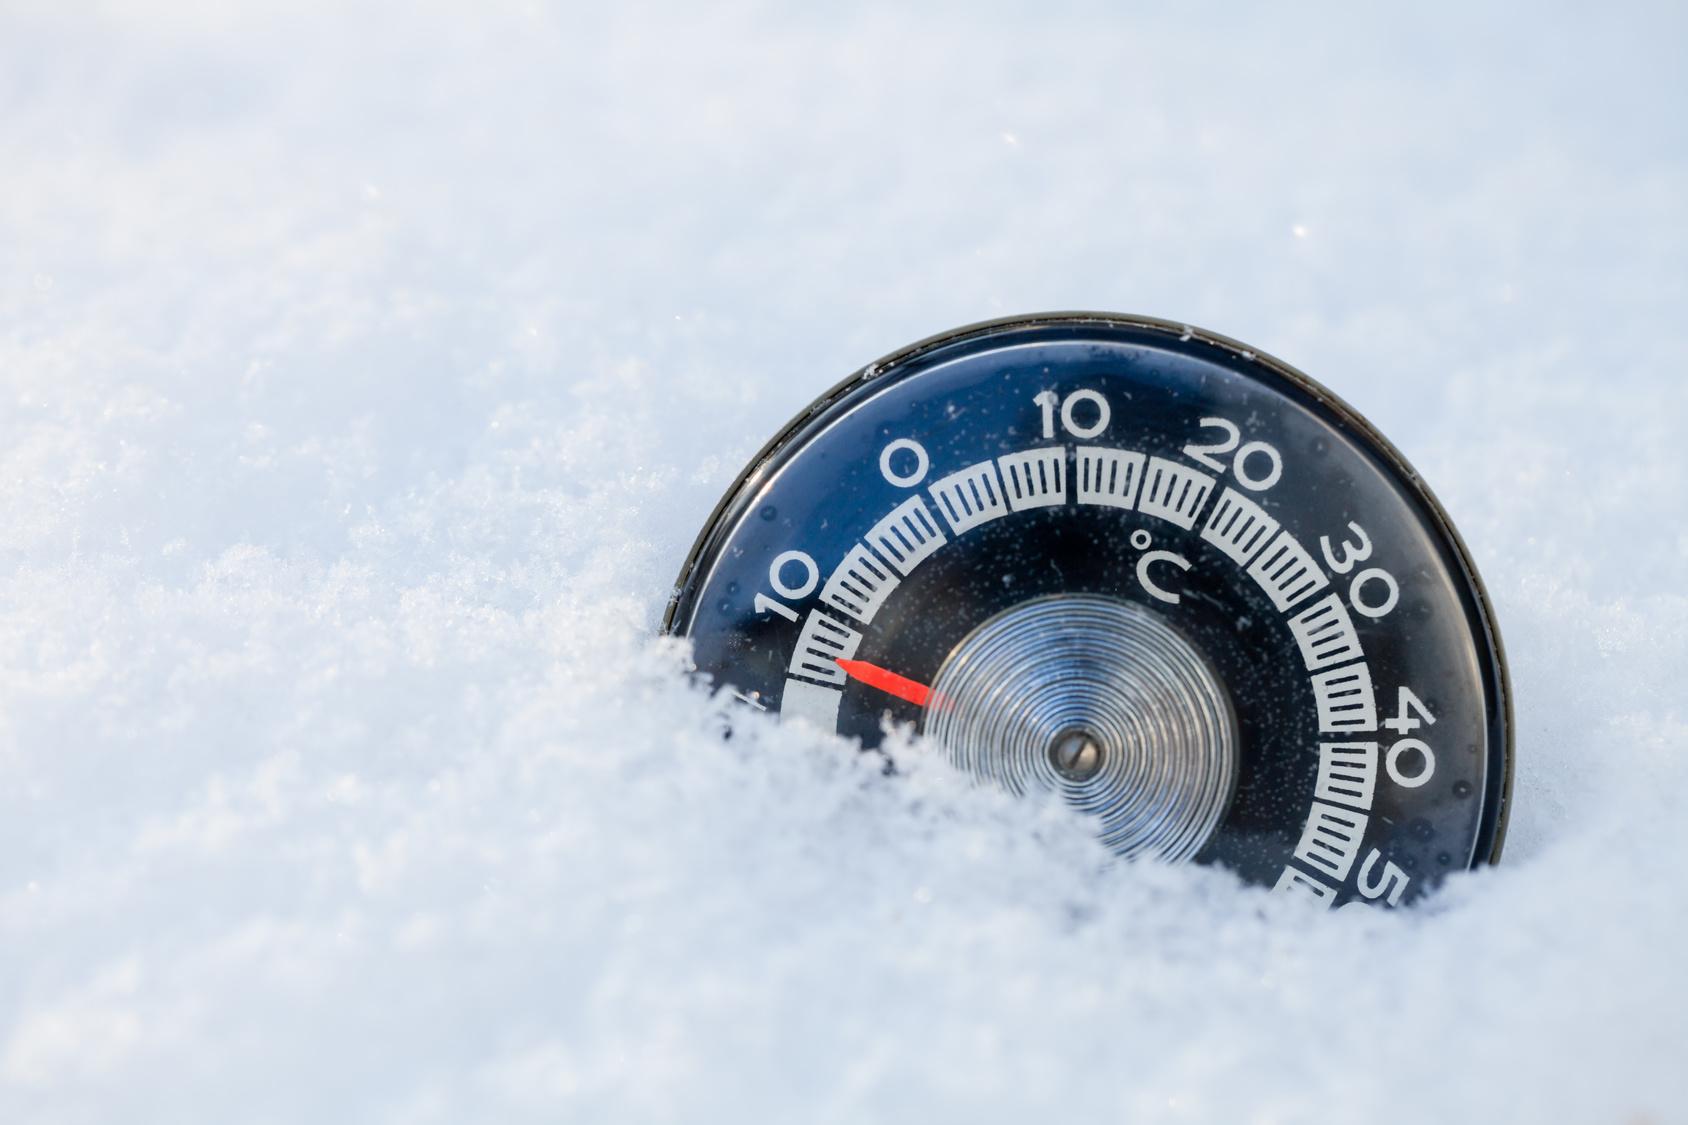 termometr temperatura mróz - Fotolia